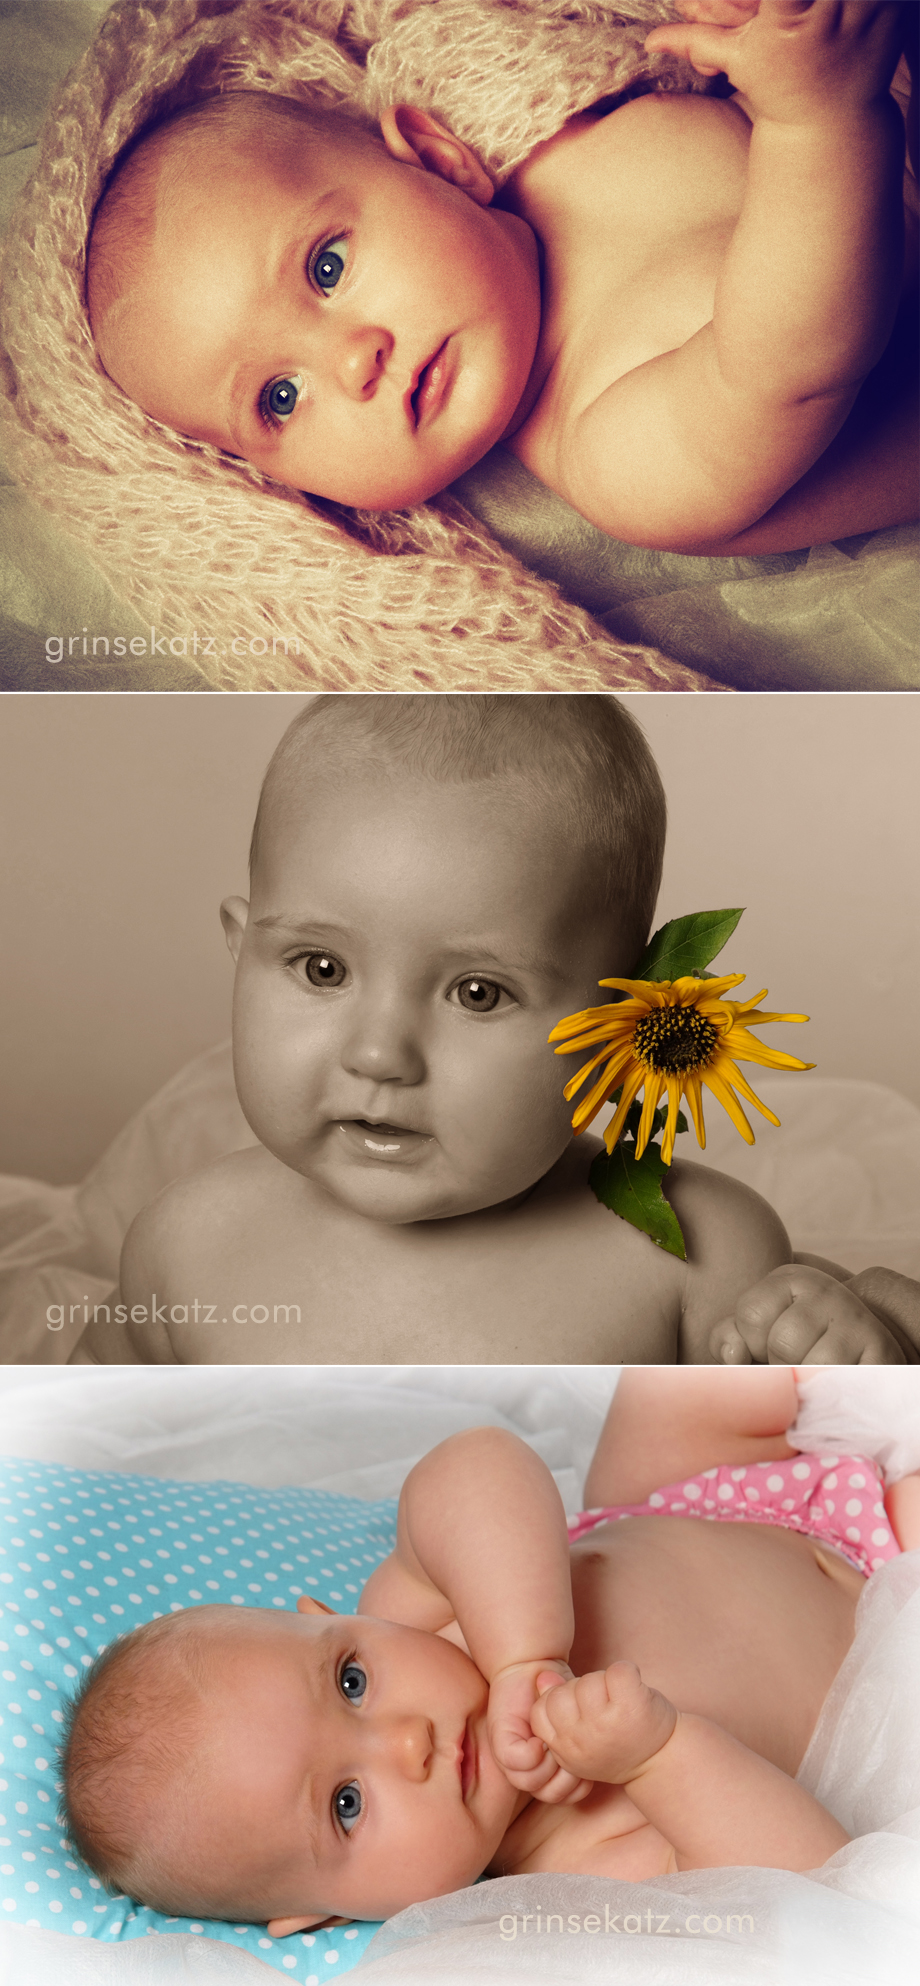 kinderfotografie Baby fotograf grinsekatz